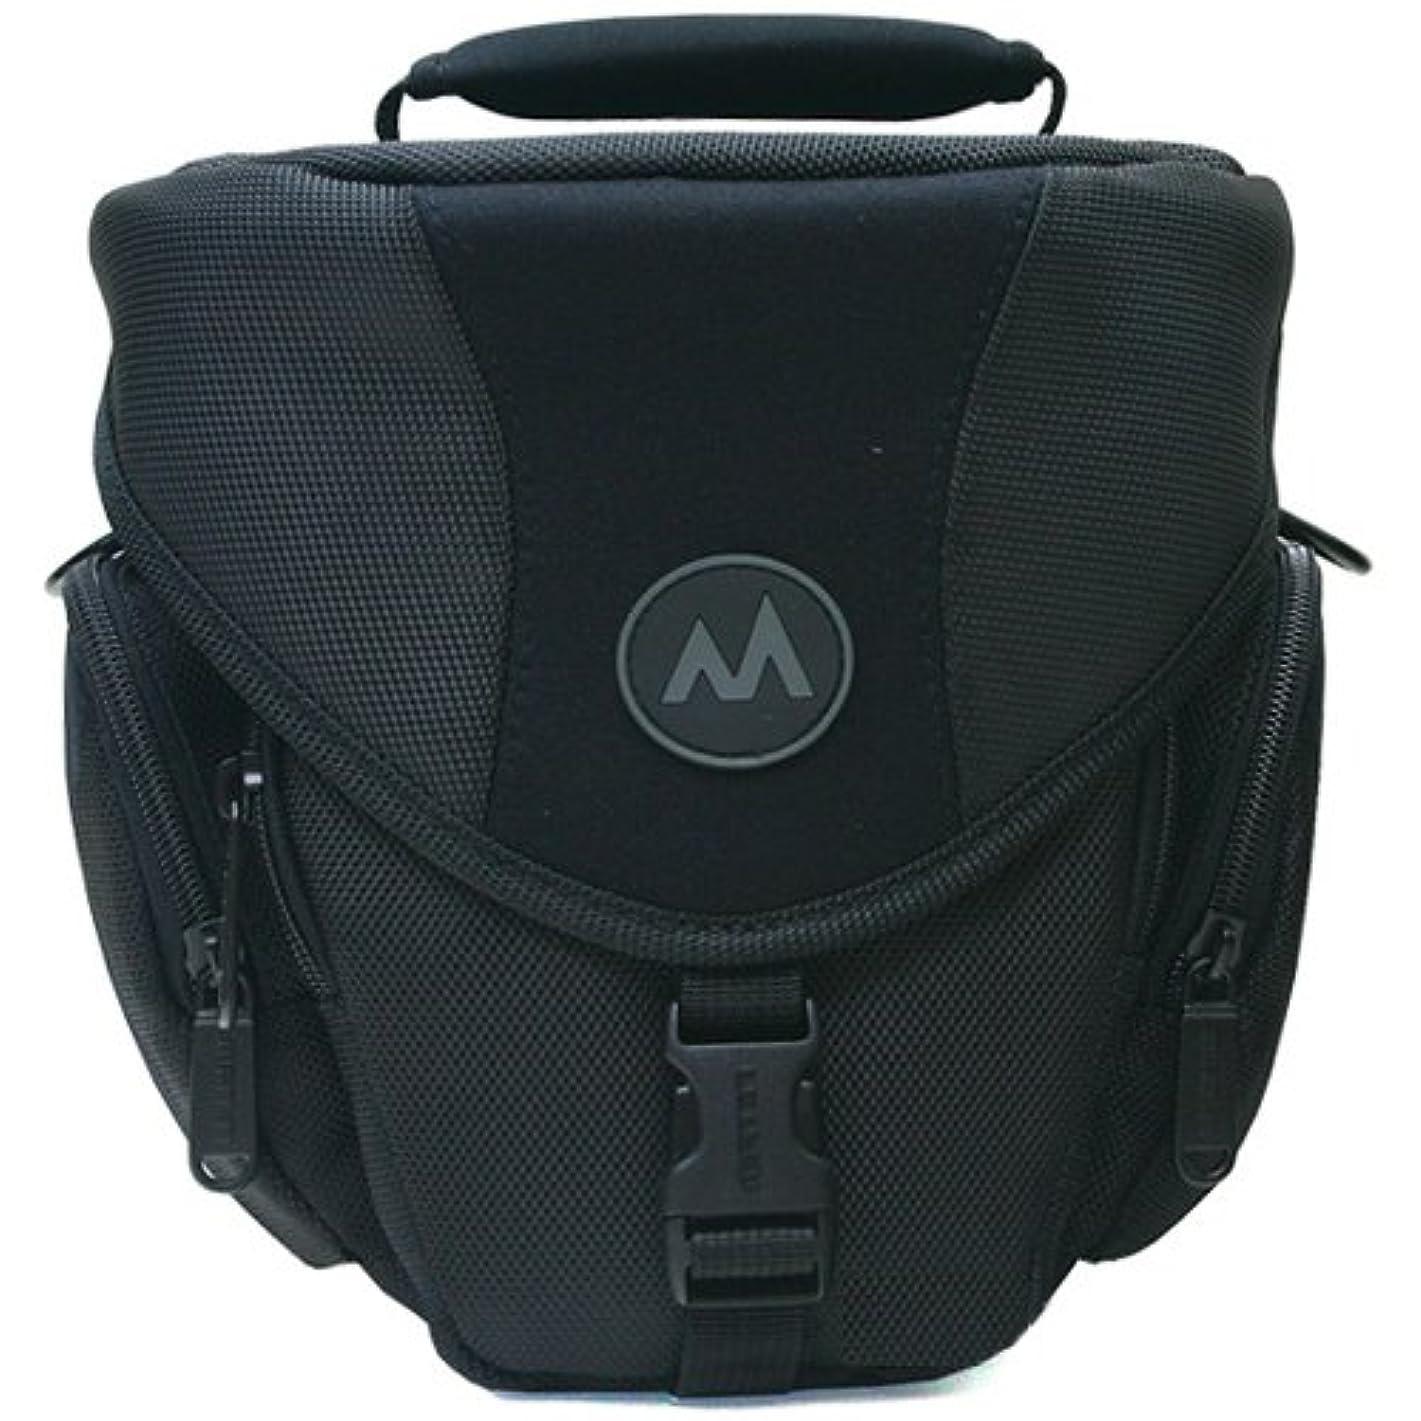 MATIN D-SLR RF Mirrorless Camera Lens Cushion Padded Action Zoom Shoulder Bag Case PONY-17